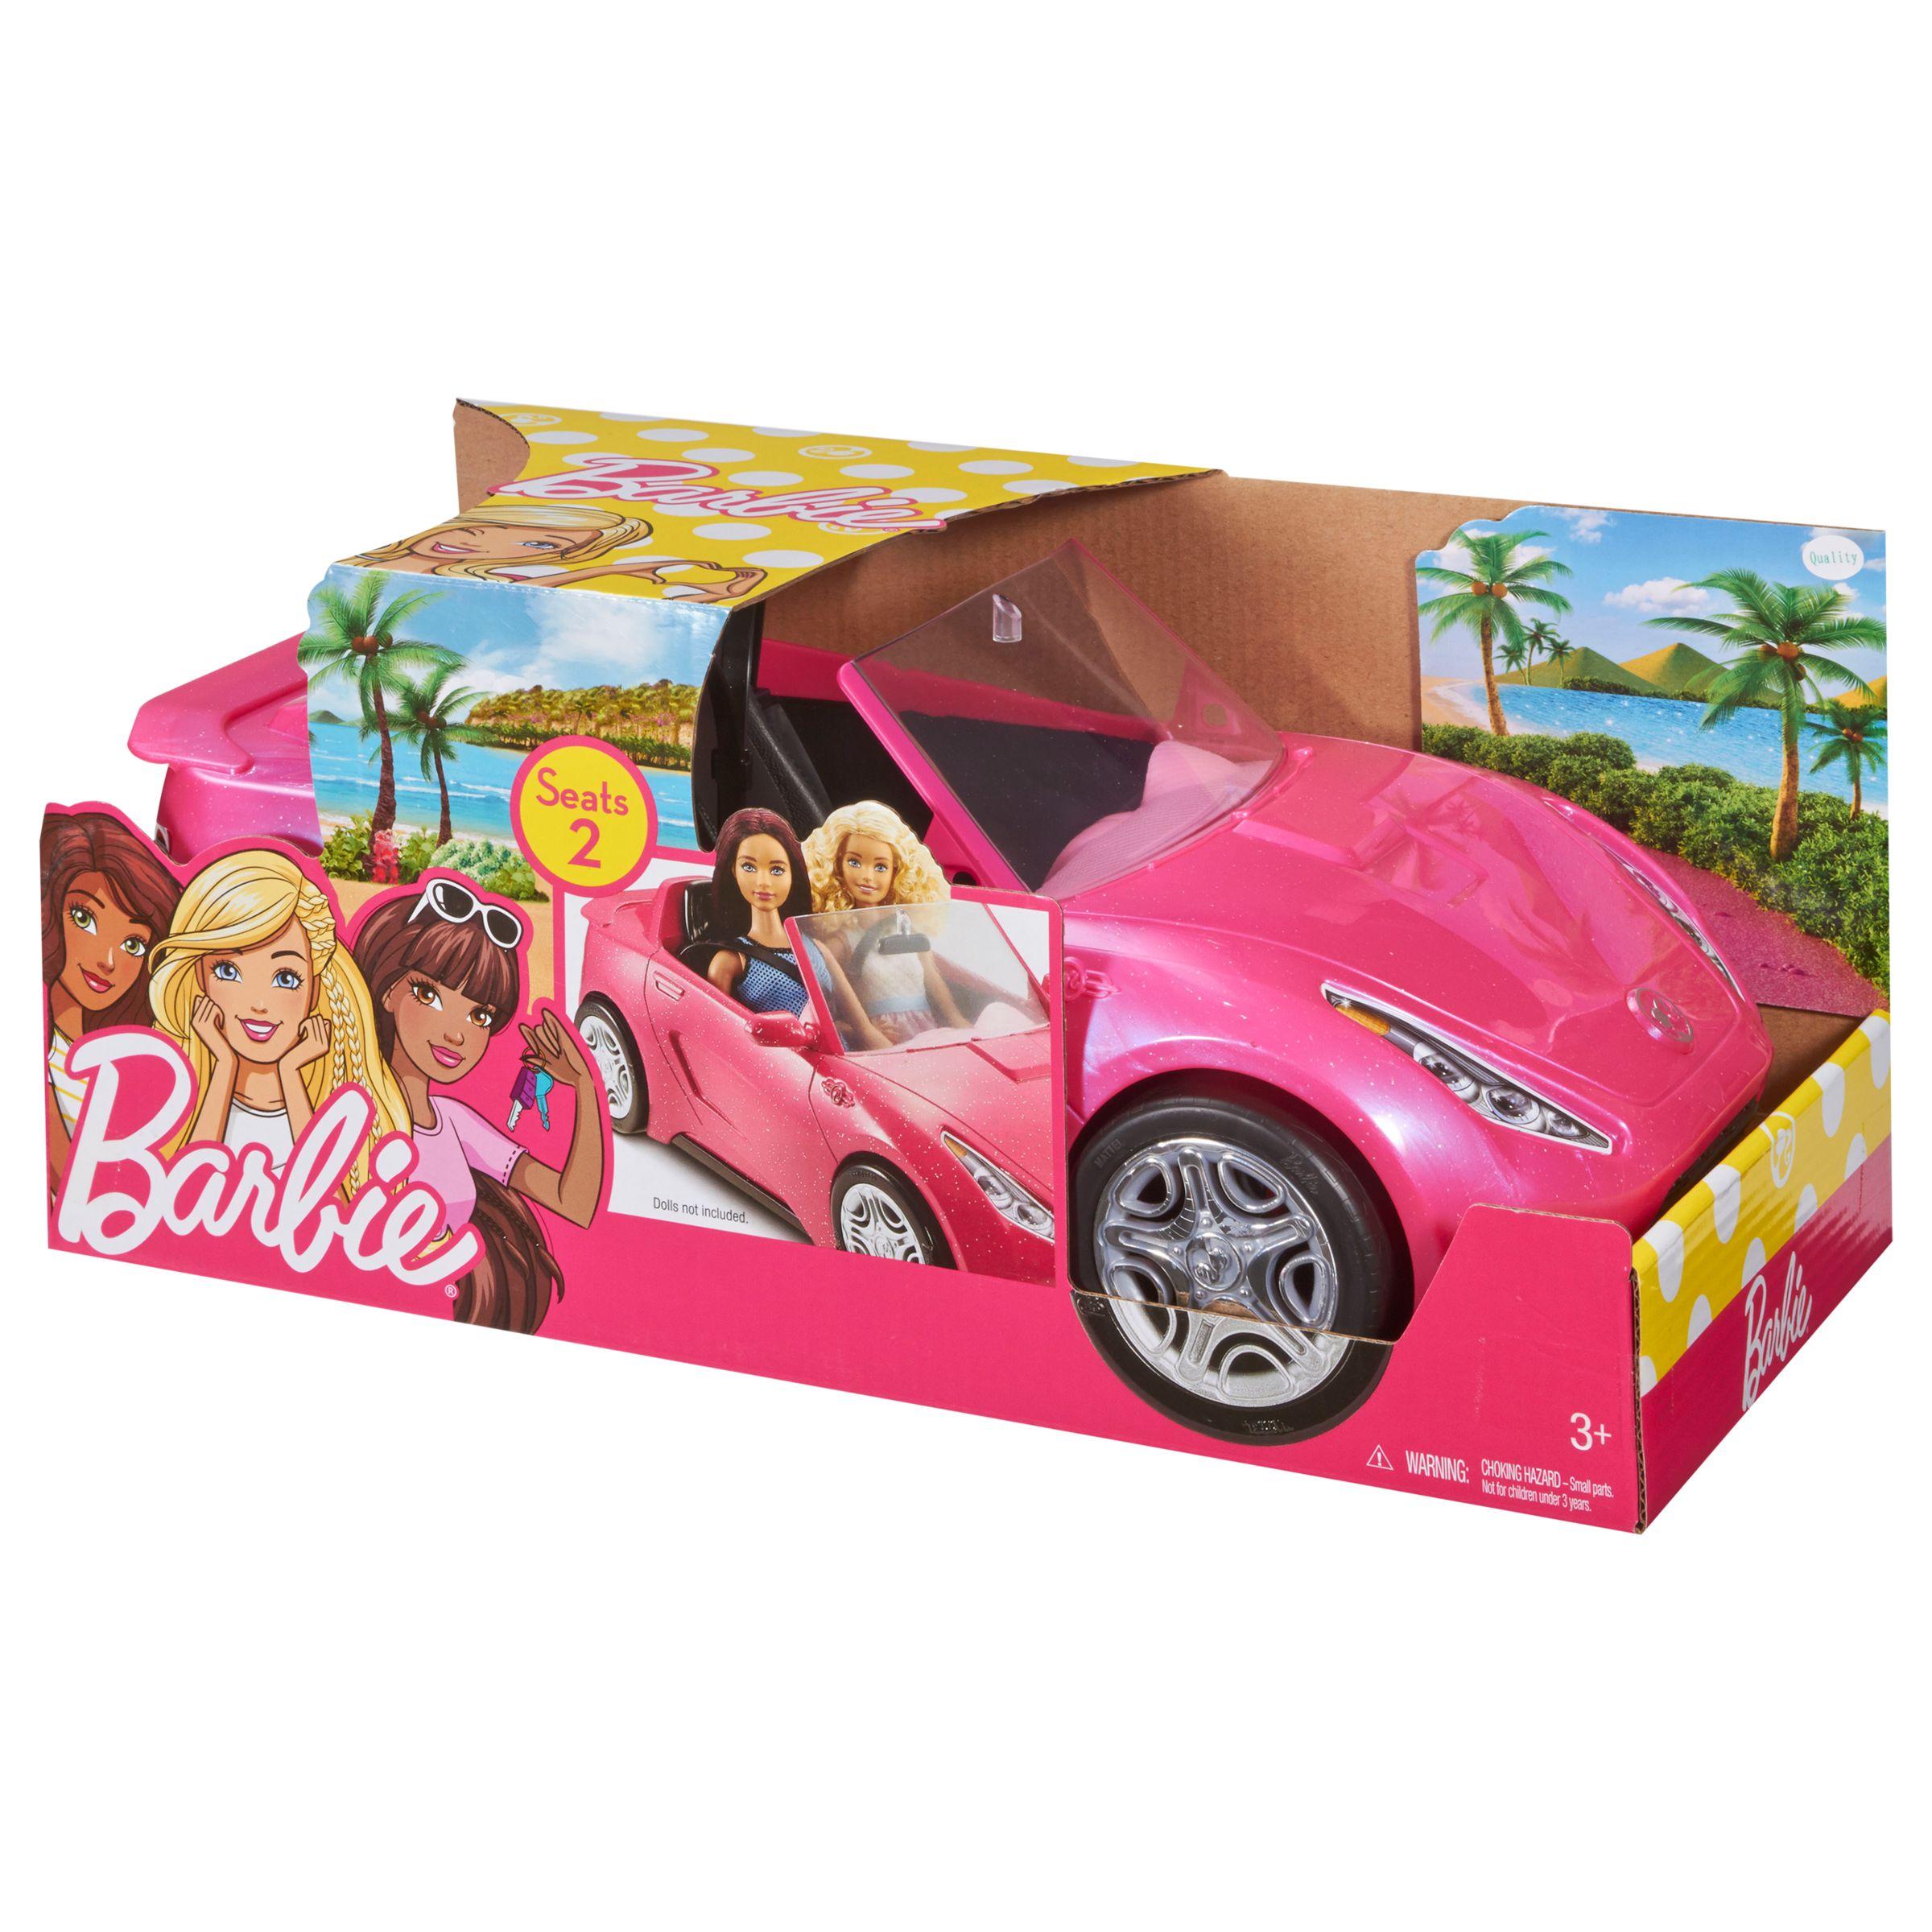 Barbie Barbie Glam Convertible Car